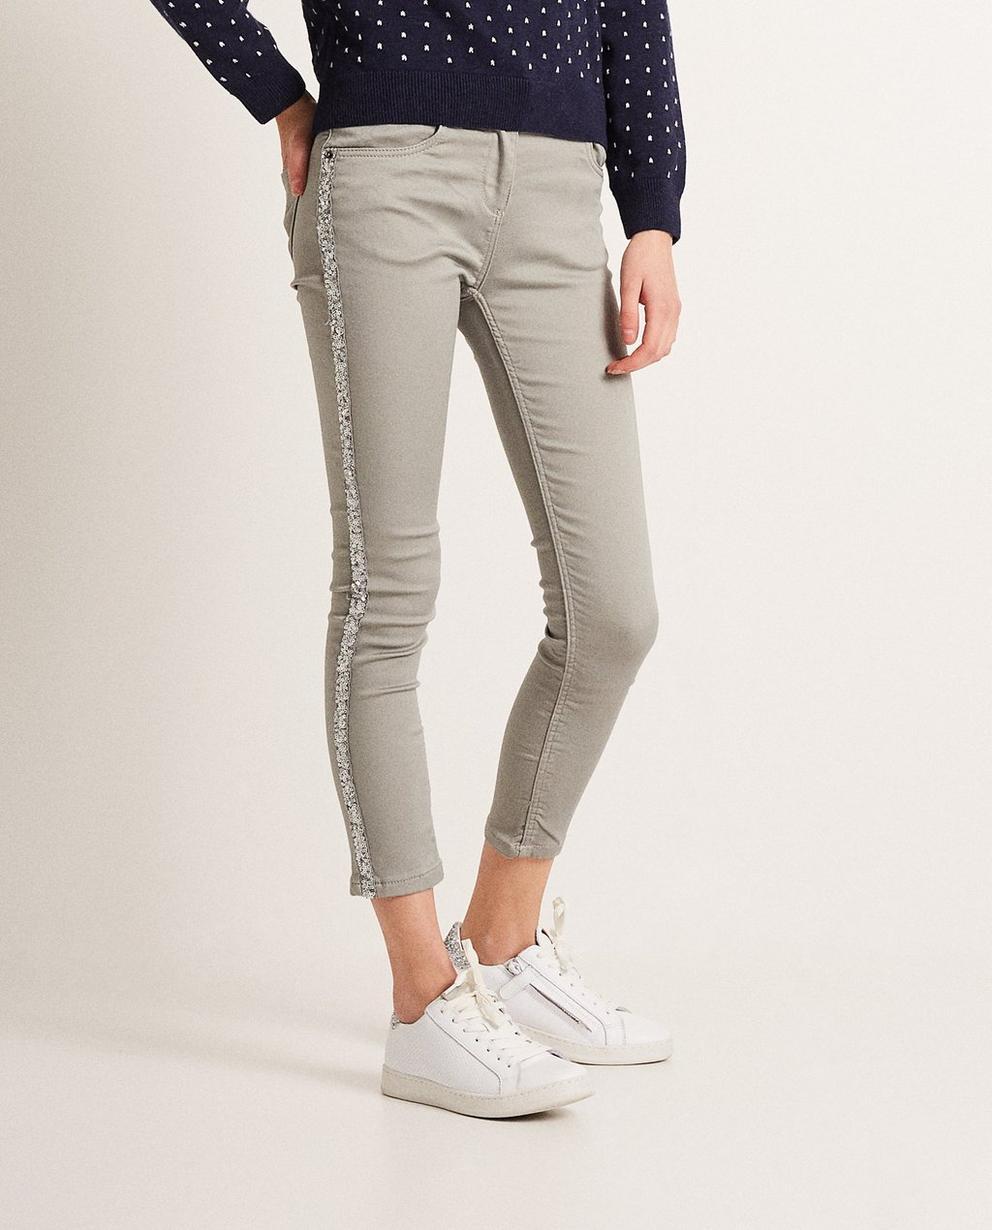 Jeans - Braun - Jeans met paillettenstrook